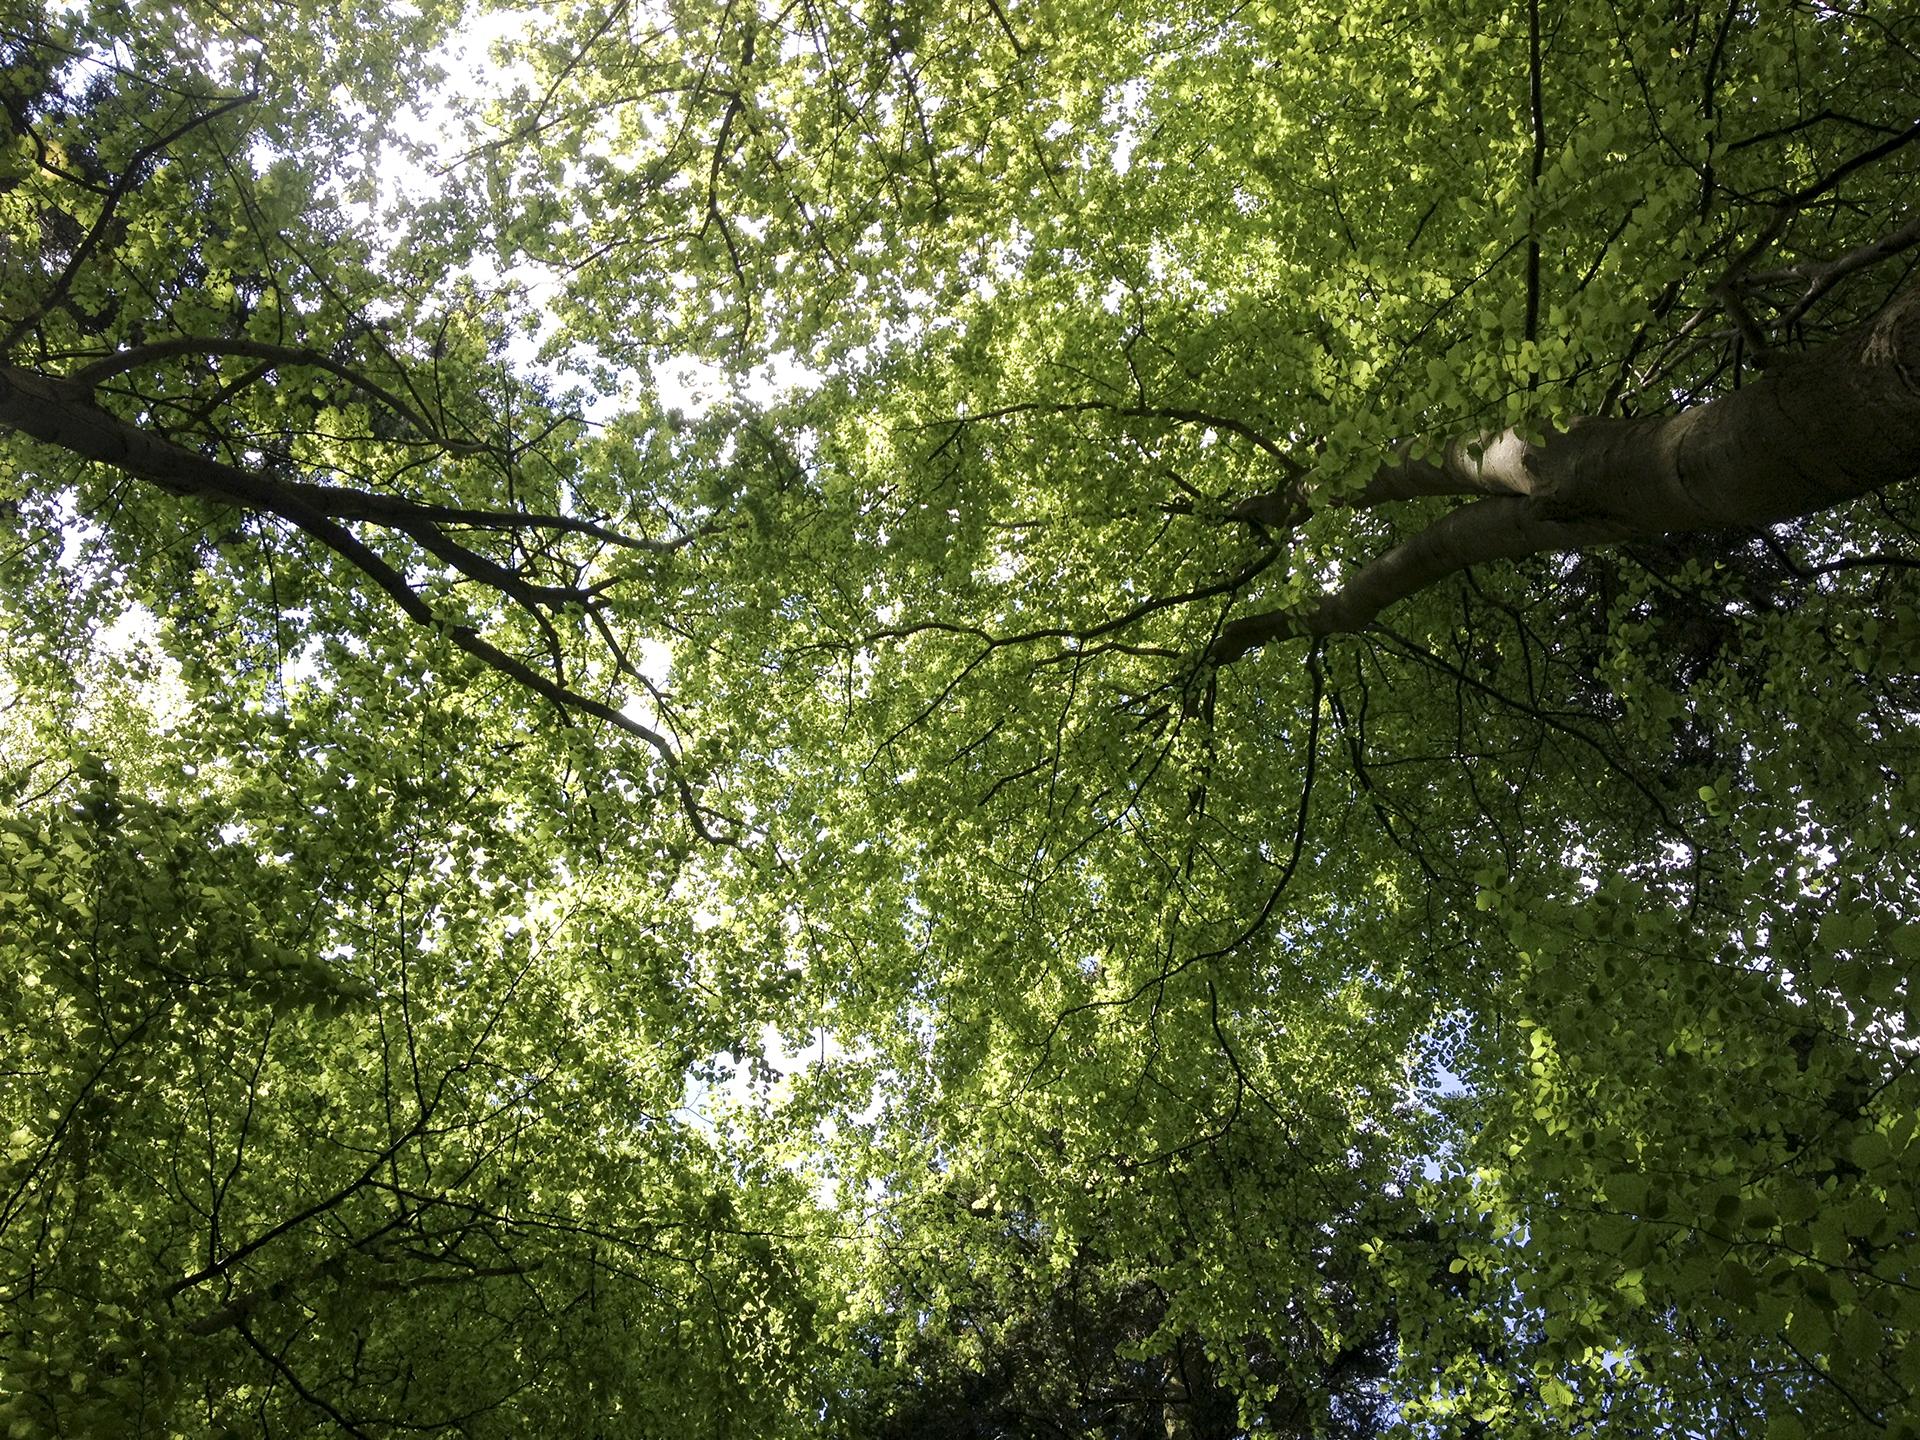 Kalmia center mod stress skov sommer